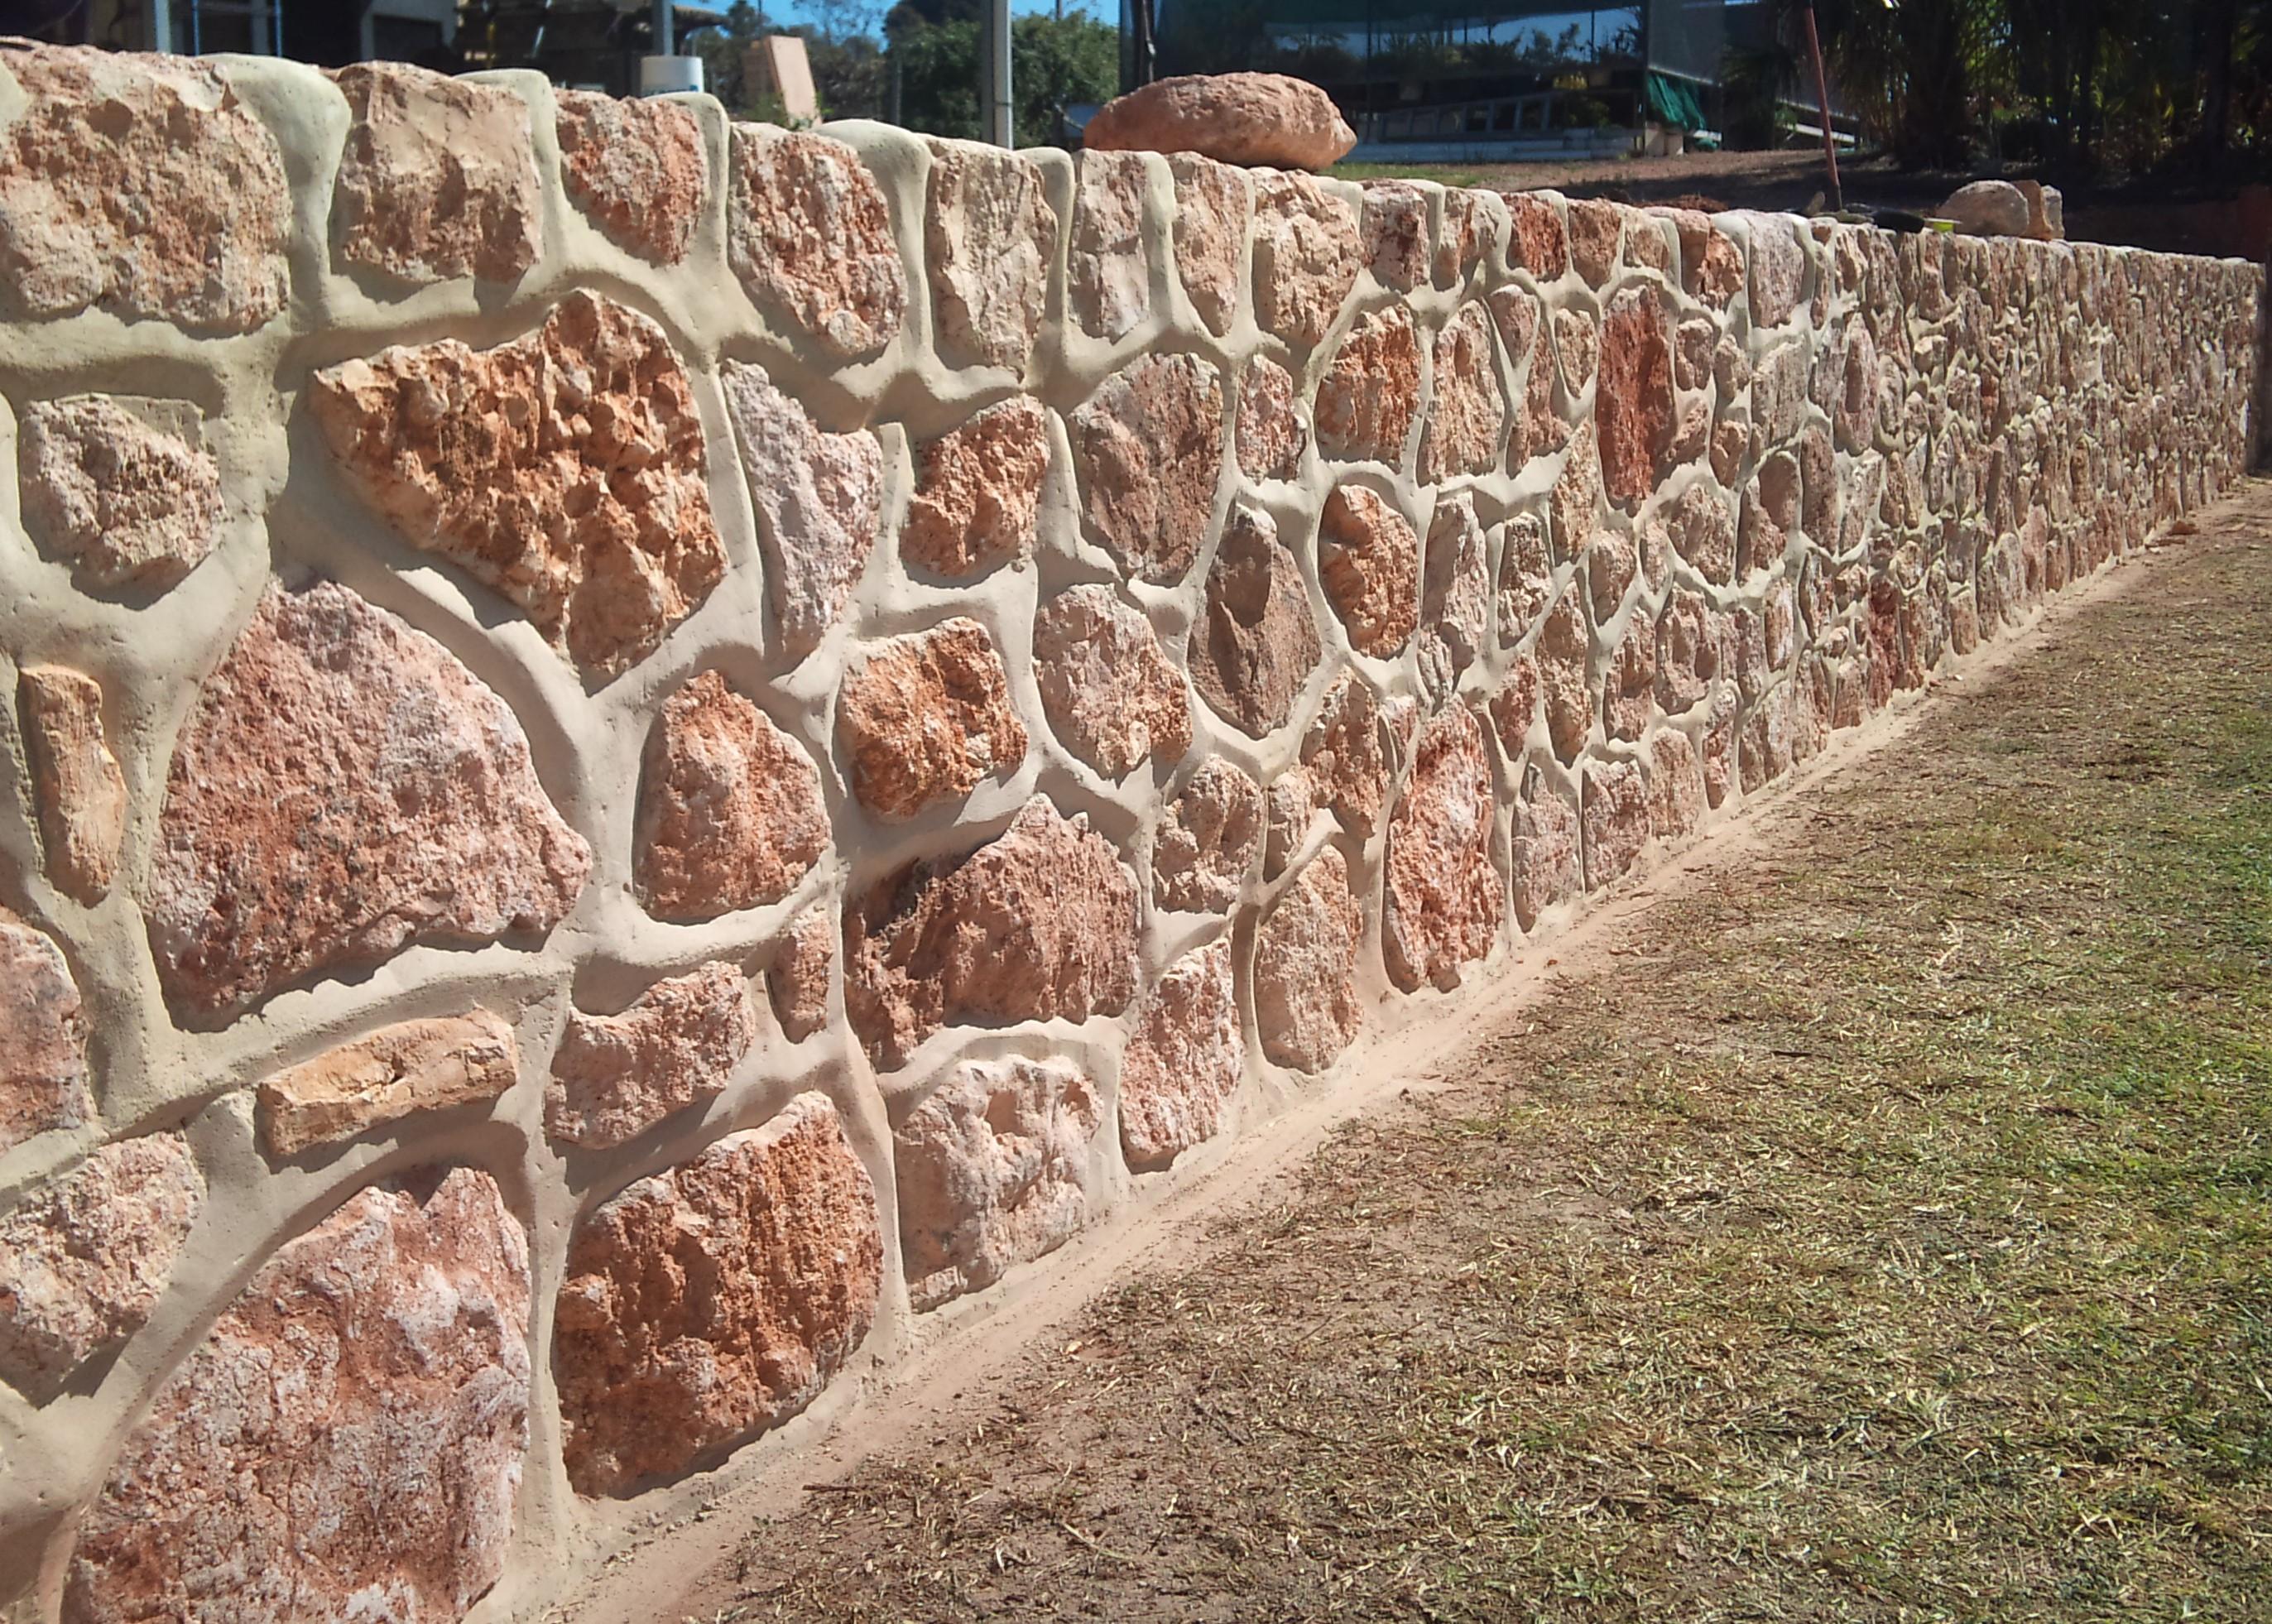 stone walls ace brick and stonework stonemasons. Black Bedroom Furniture Sets. Home Design Ideas